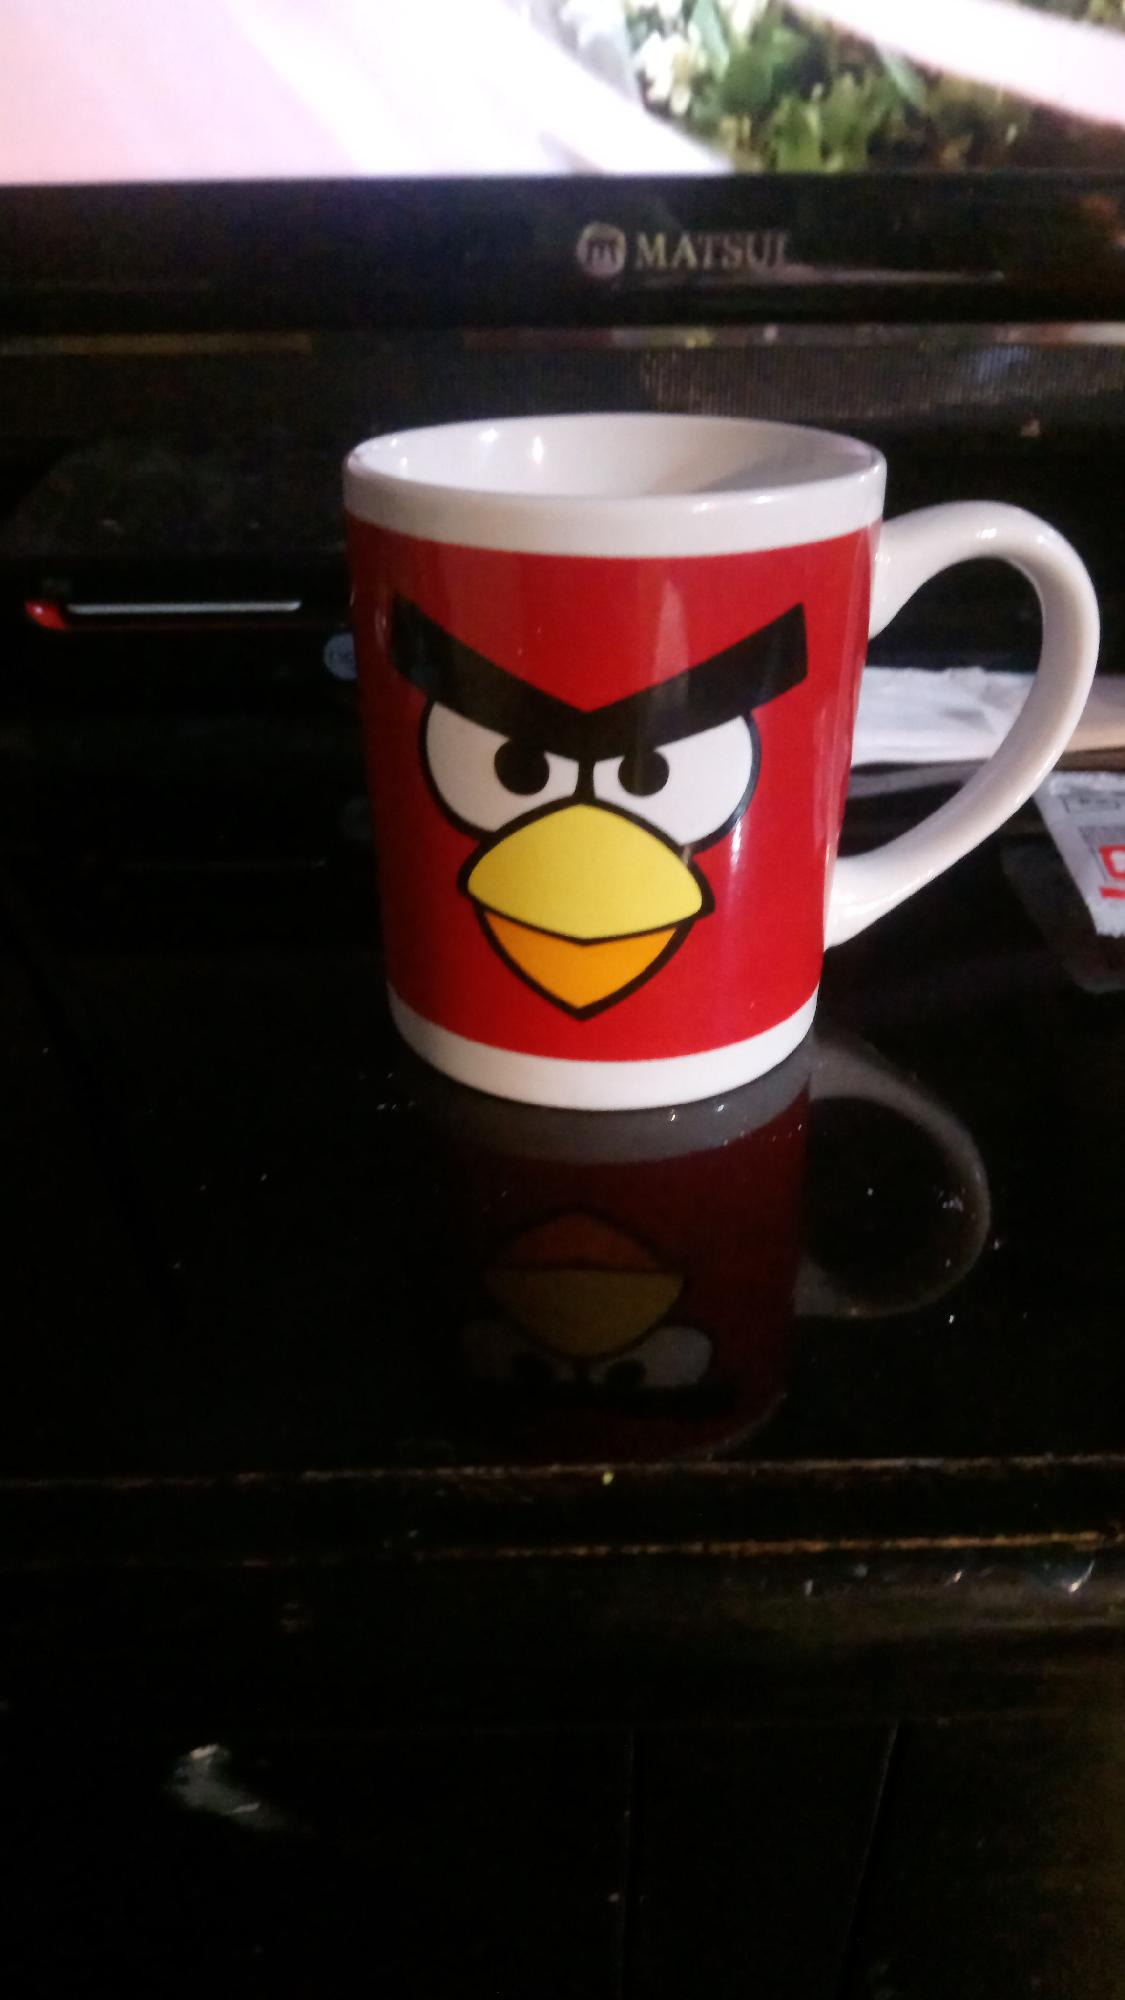 Miren mi taza de Angry Birds